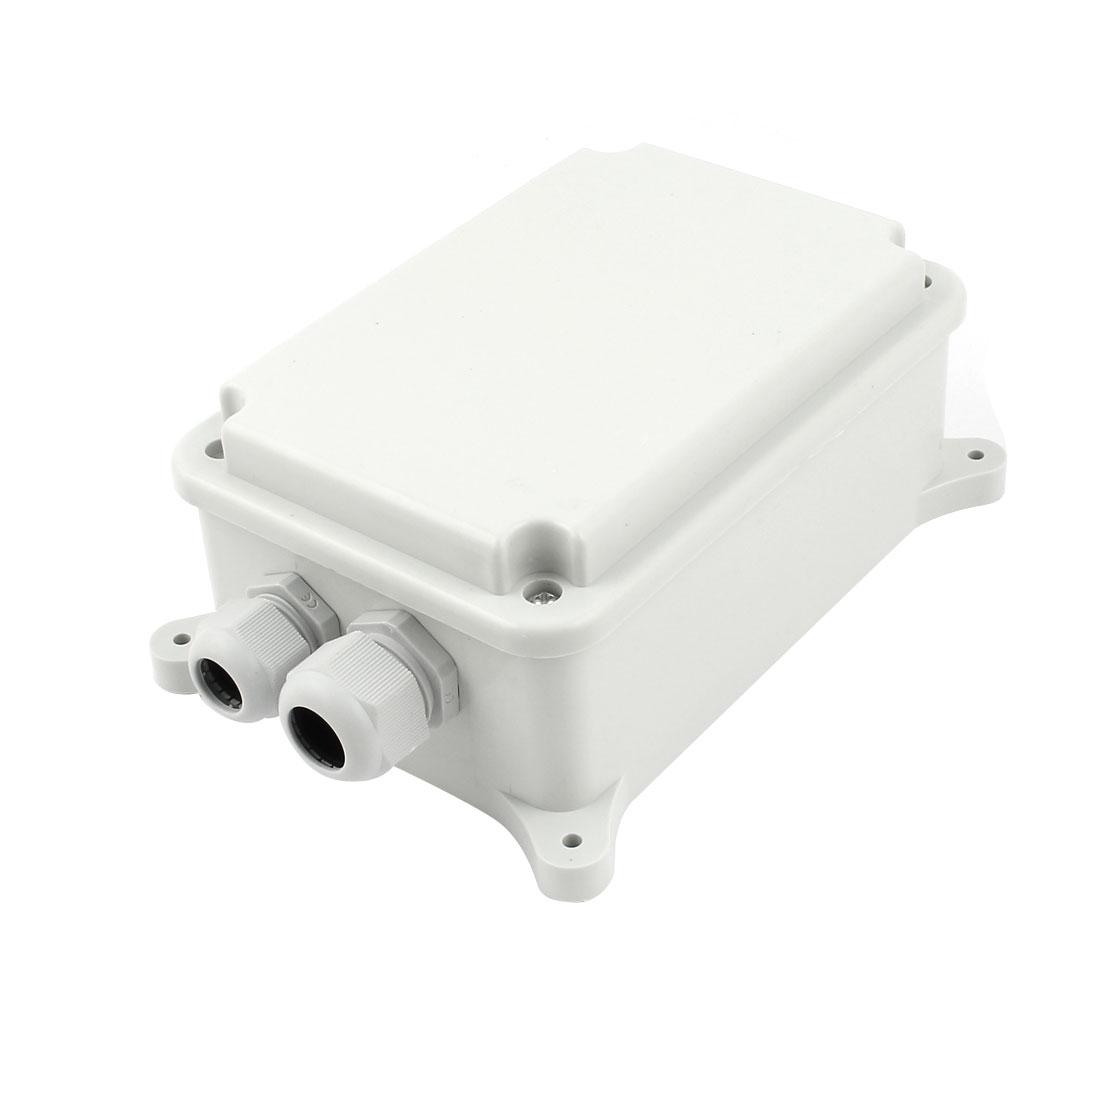 183mm x 132mm x 75mm Waterproof Plastic Rectangle DIY Junction Box Hinged Lid